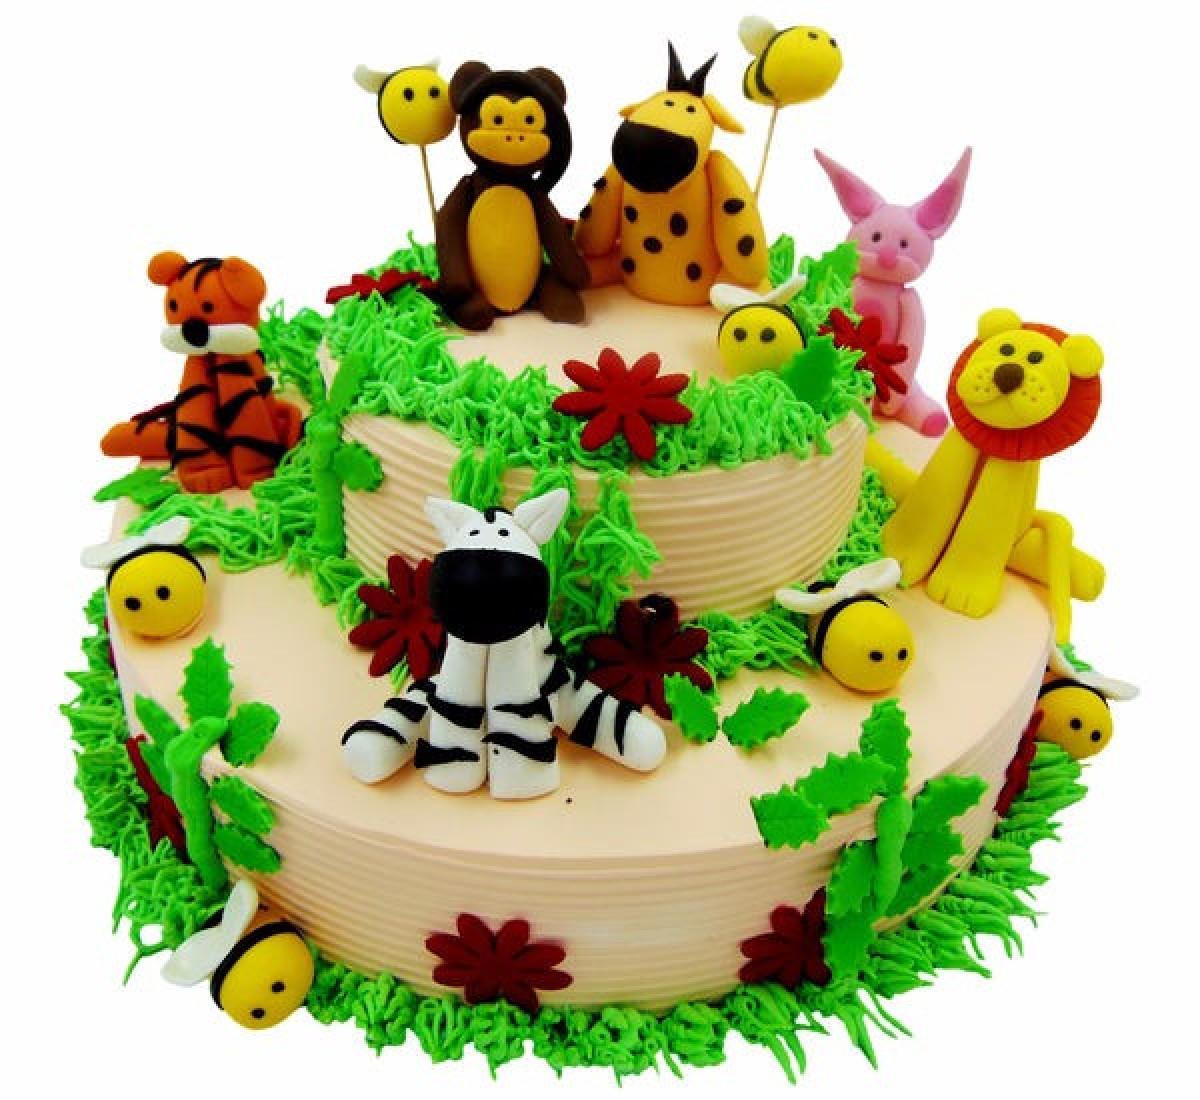 online cake order online cake home delivery in coimbatore friend. Black Bedroom Furniture Sets. Home Design Ideas